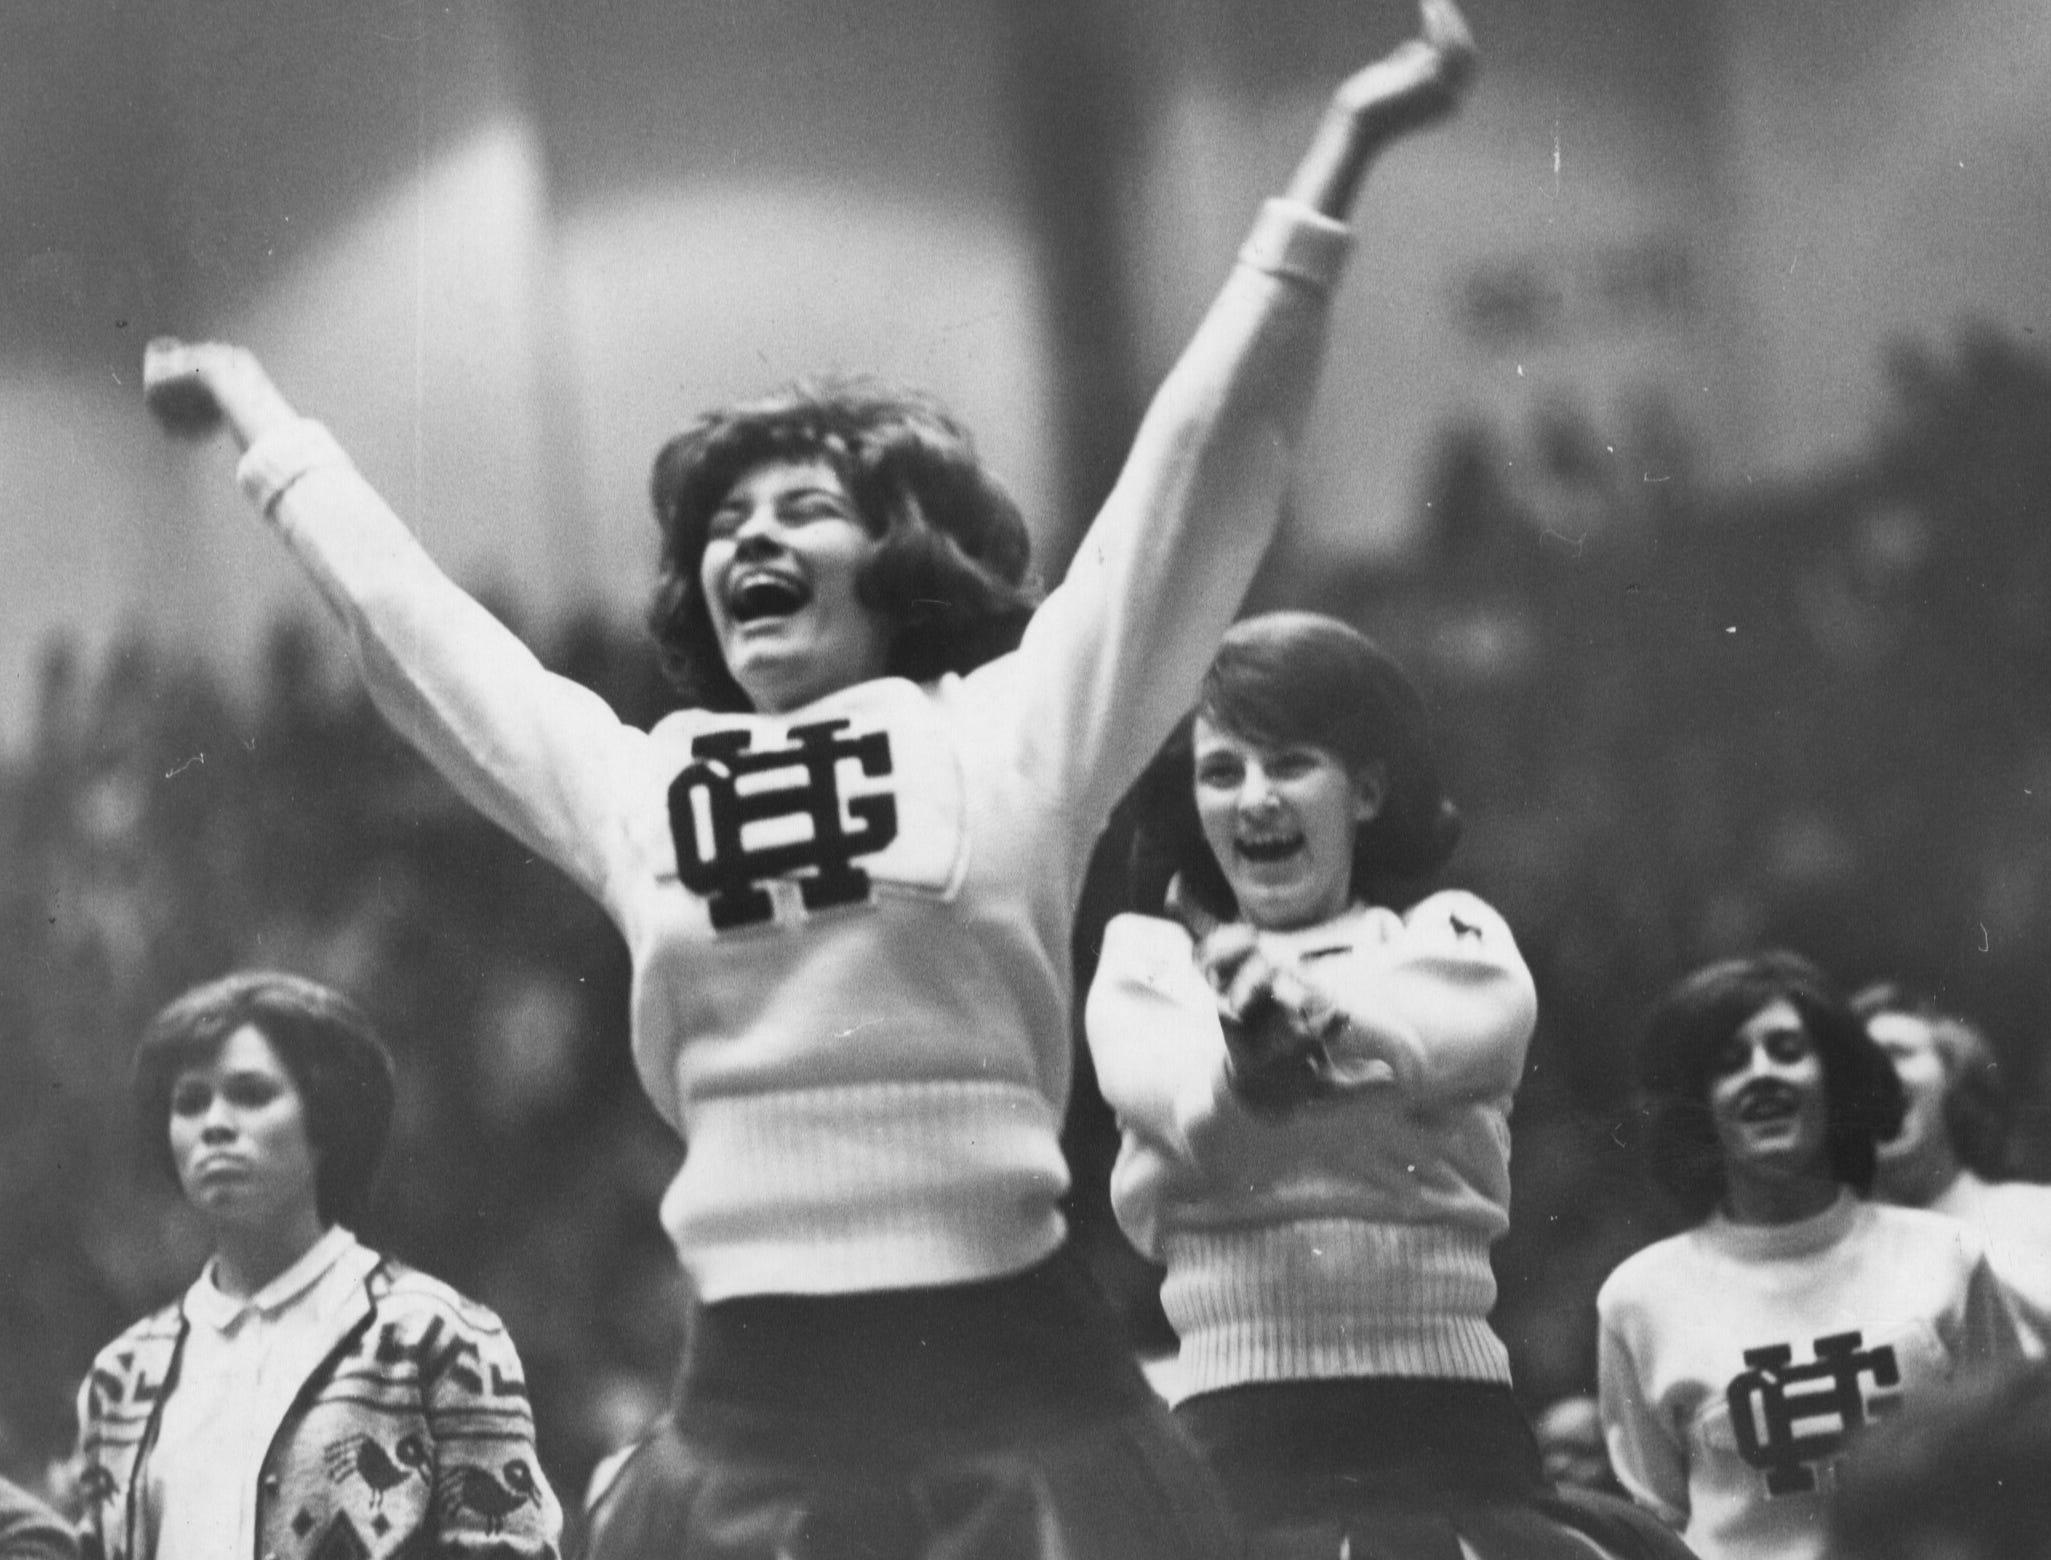 A moment of joy for the Hazel Green cheerleaders. Mar. 20, 1965